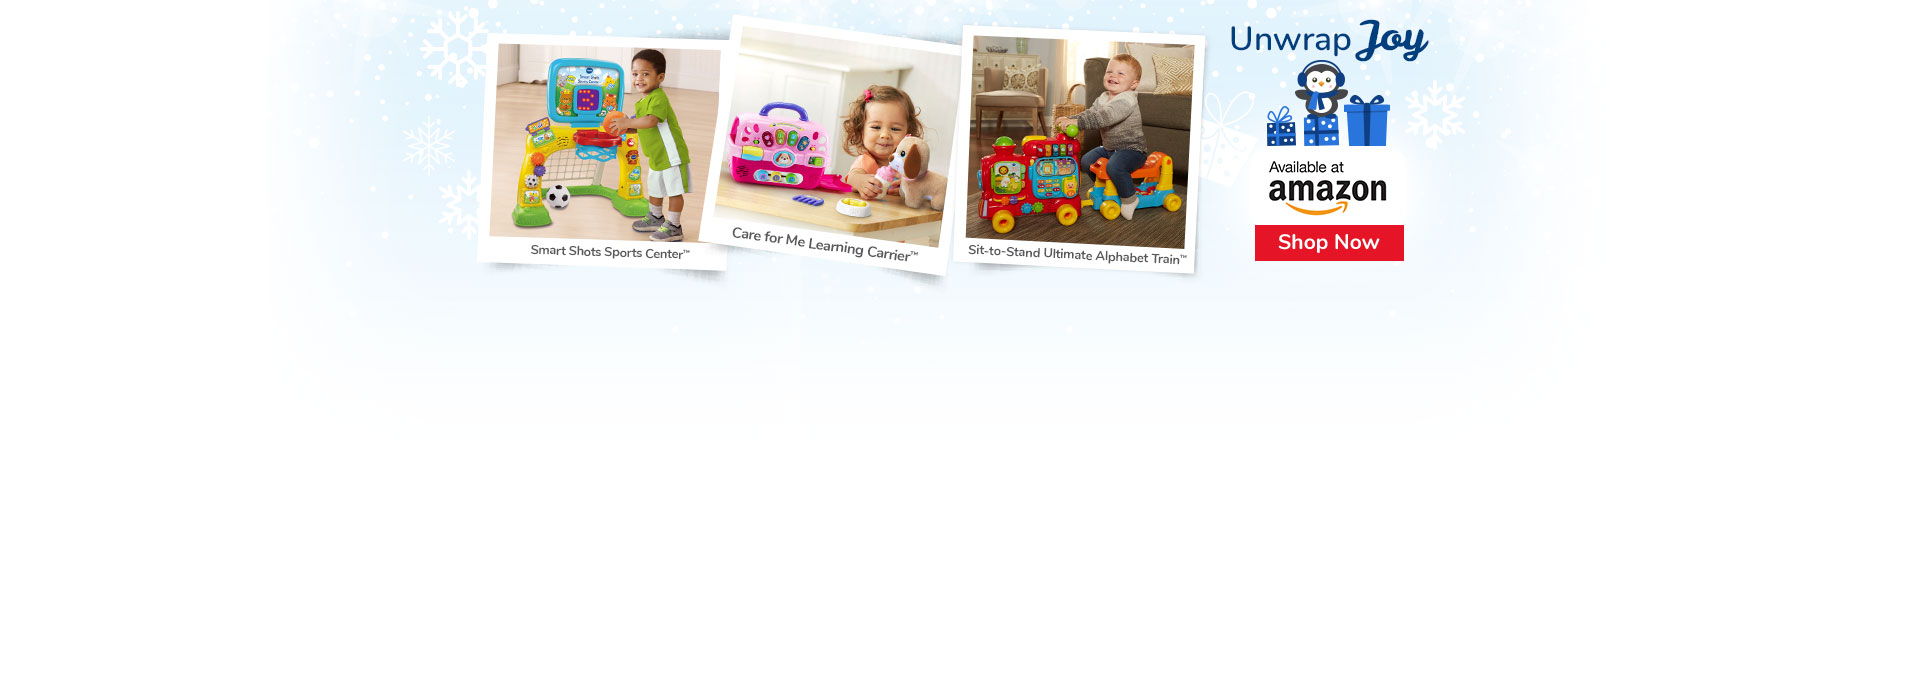 Shop Top Holiday Toys at Amazon